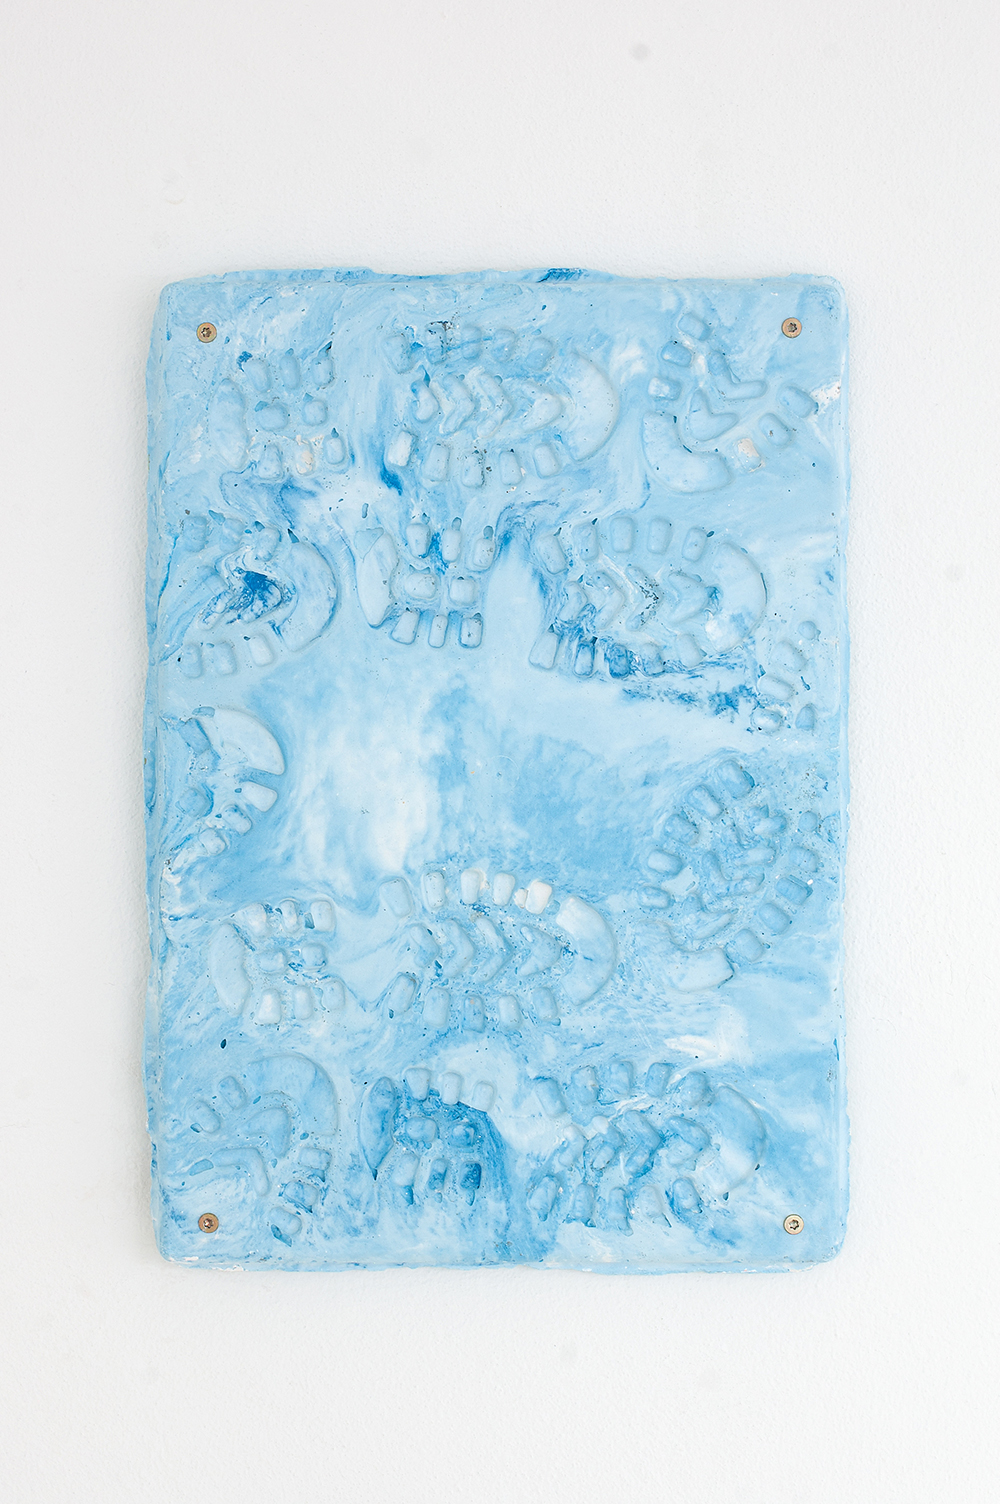 Johanne Skovbo Lasgaard, Jenka92, gips, akrylmaling, sølvglimmer, metal, 35 x 45 x 5 cm, 2018. Photo: Jacob Friis-Holm Nielsen.